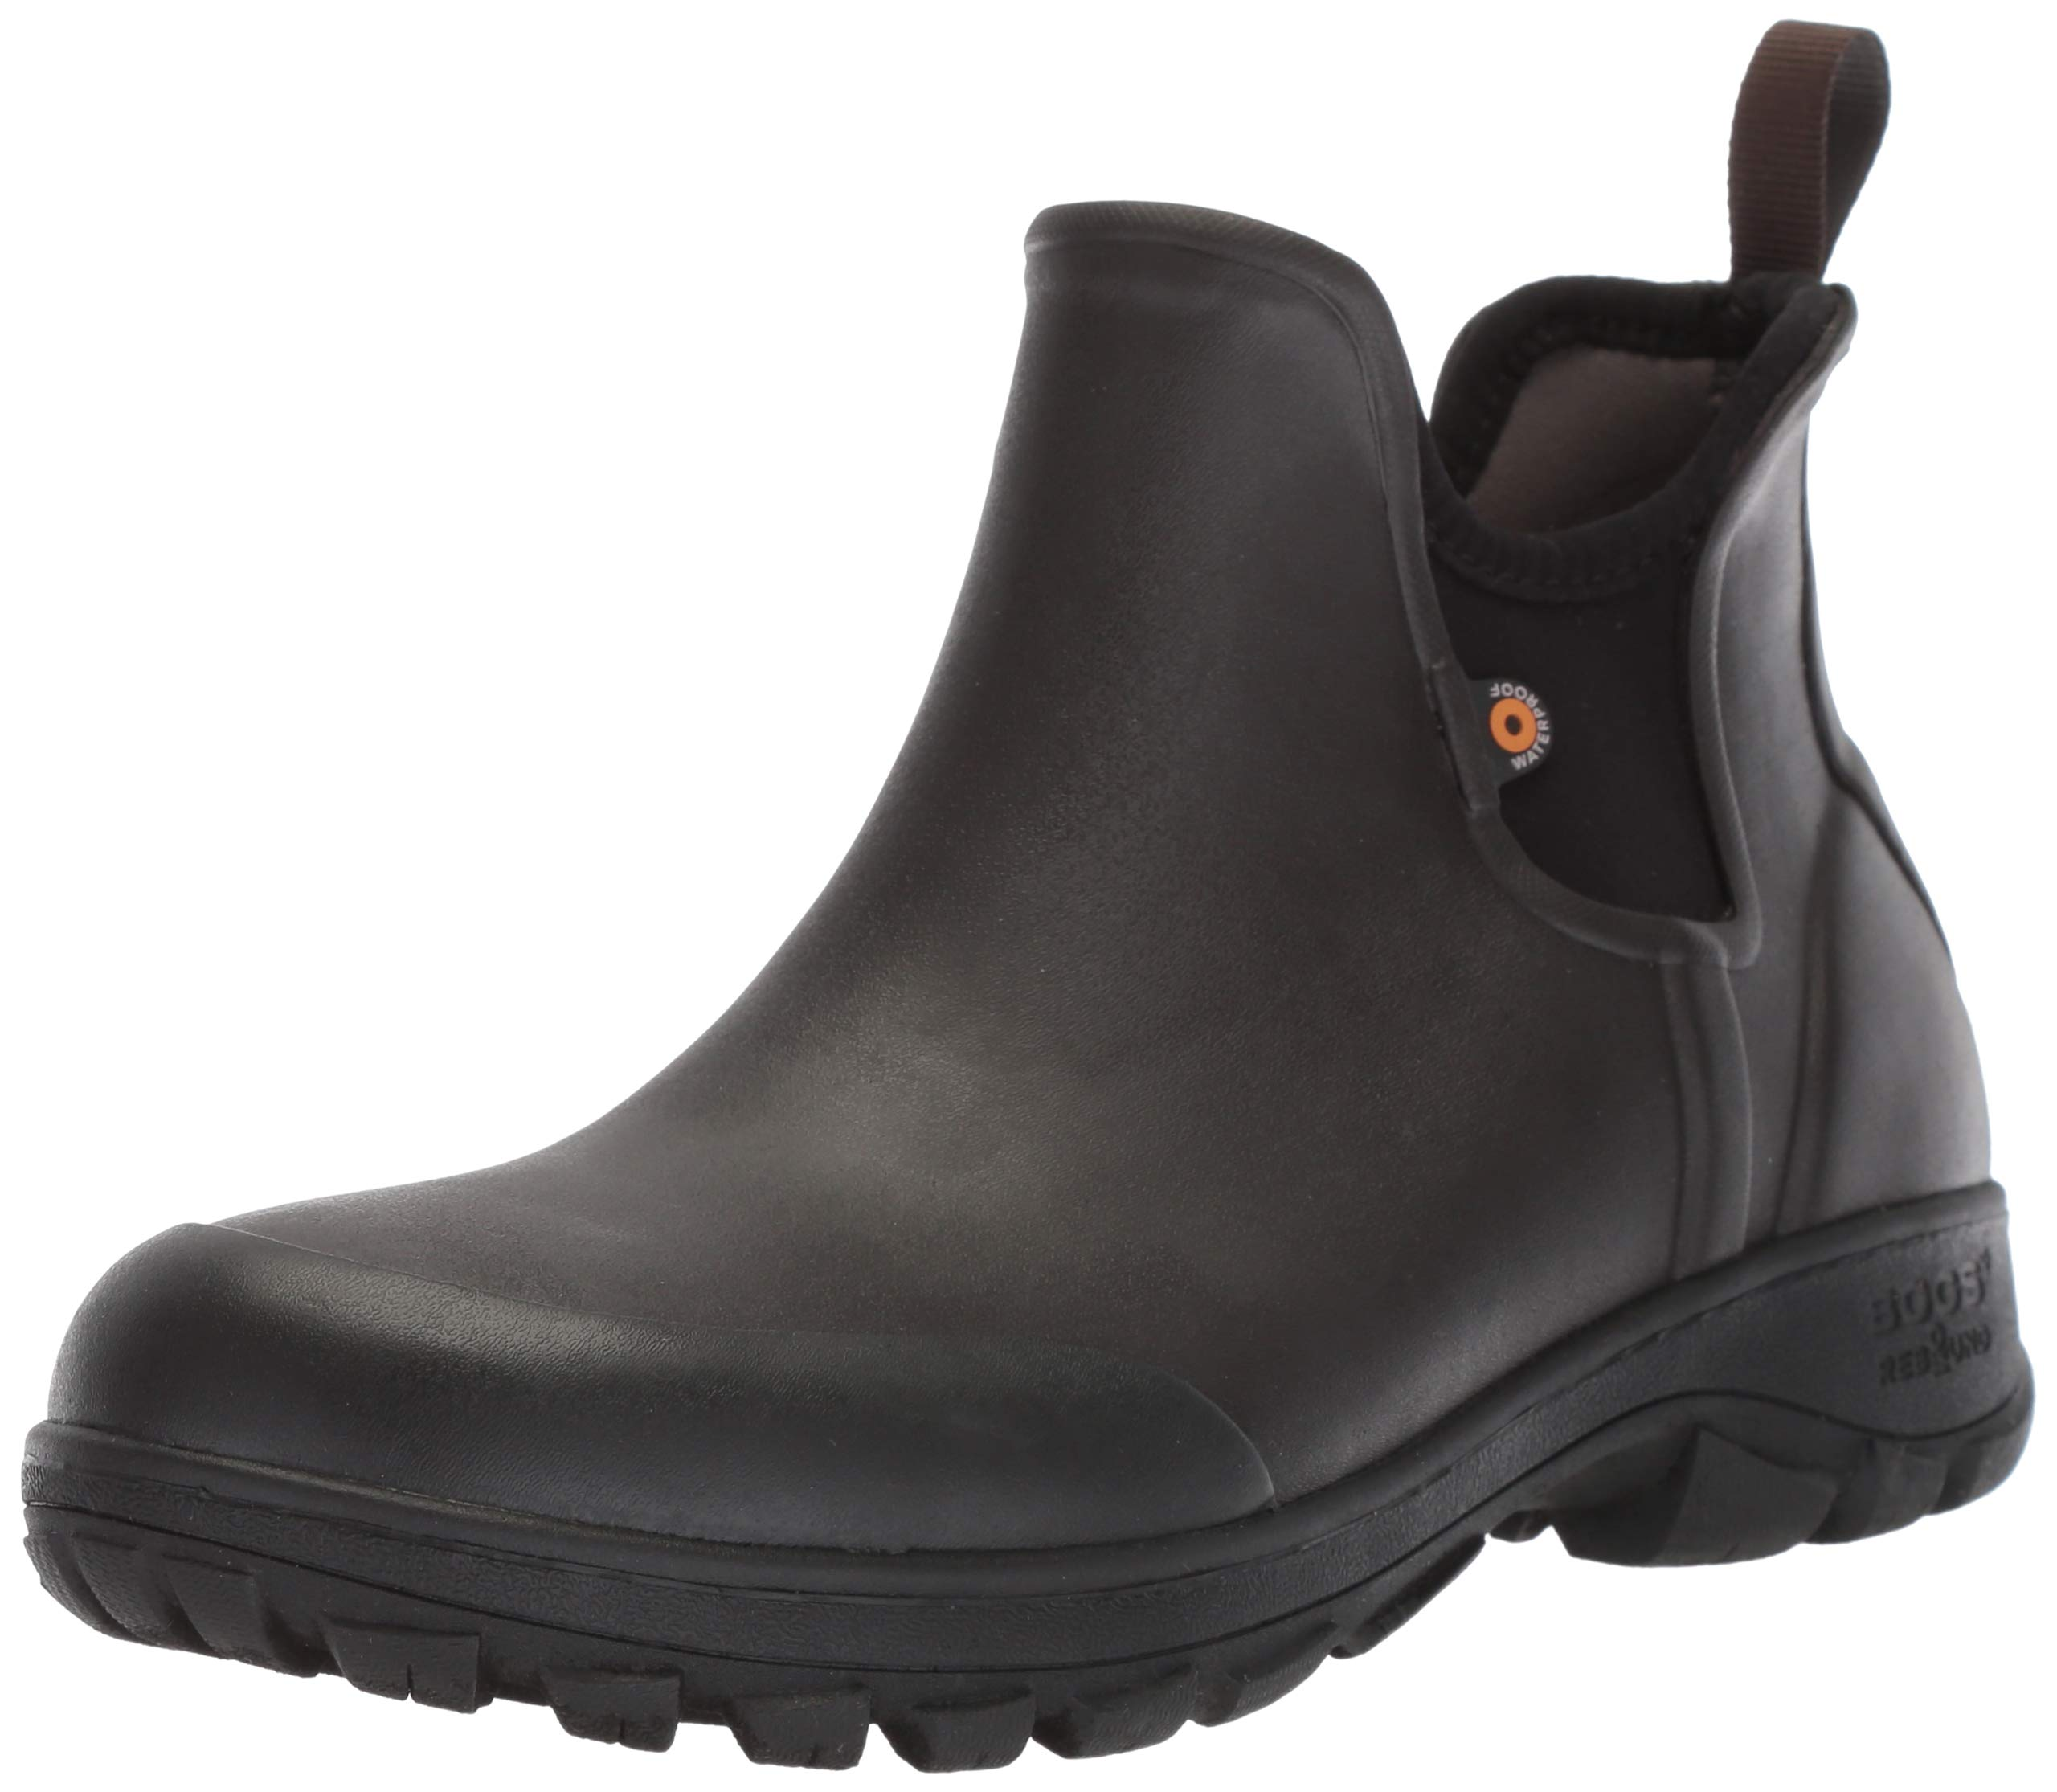 Bogs Men's Sauvie Slip Chukka Boot, Dark Brown, 11 D(M) US